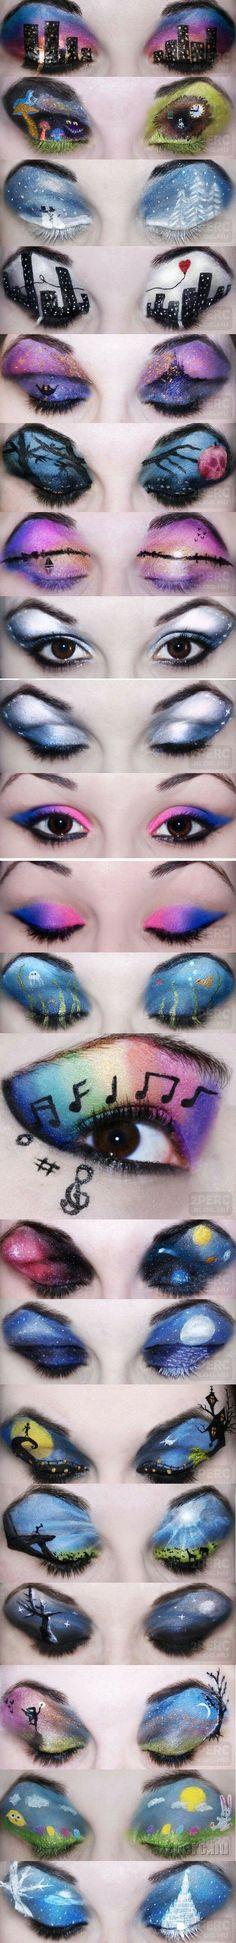 Crazy eye makeup!!